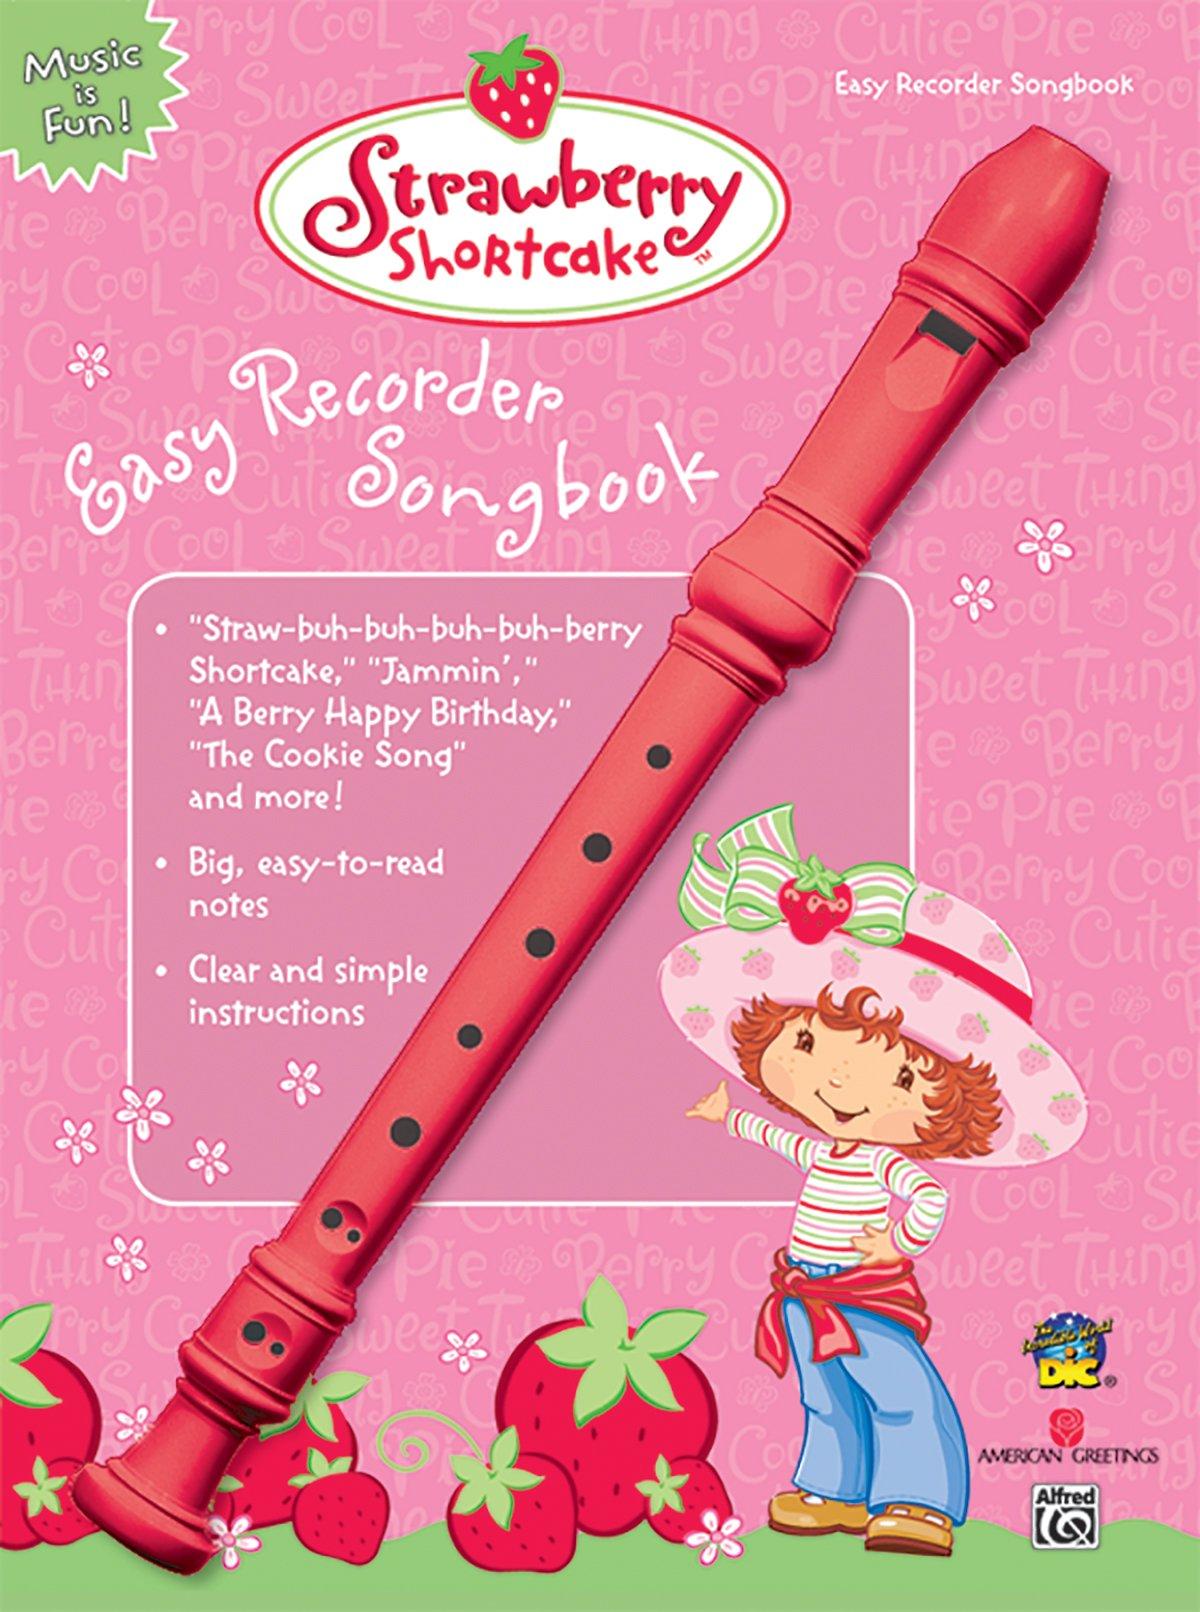 strawberry-shortcake-easy-recorder-songbook-strawberry-shortcake-alfred-publishing